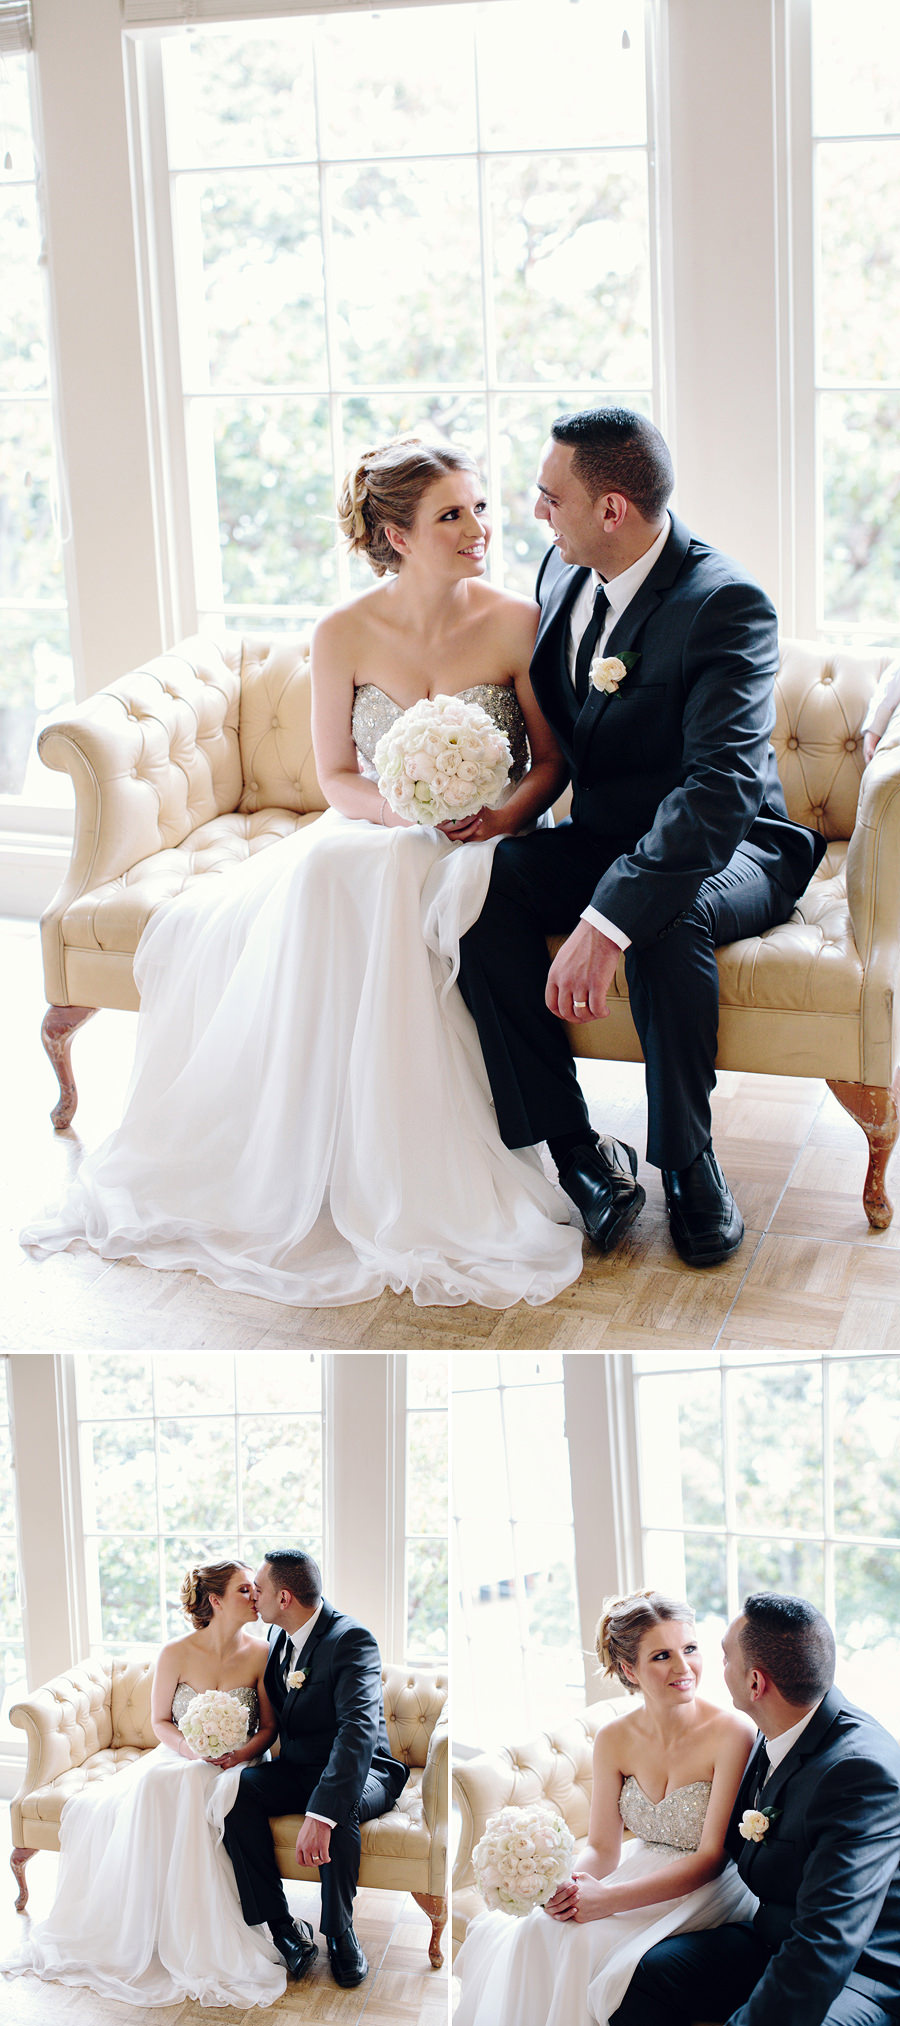 Dunbar House Wedding Photography: Bride & Groom Portraits